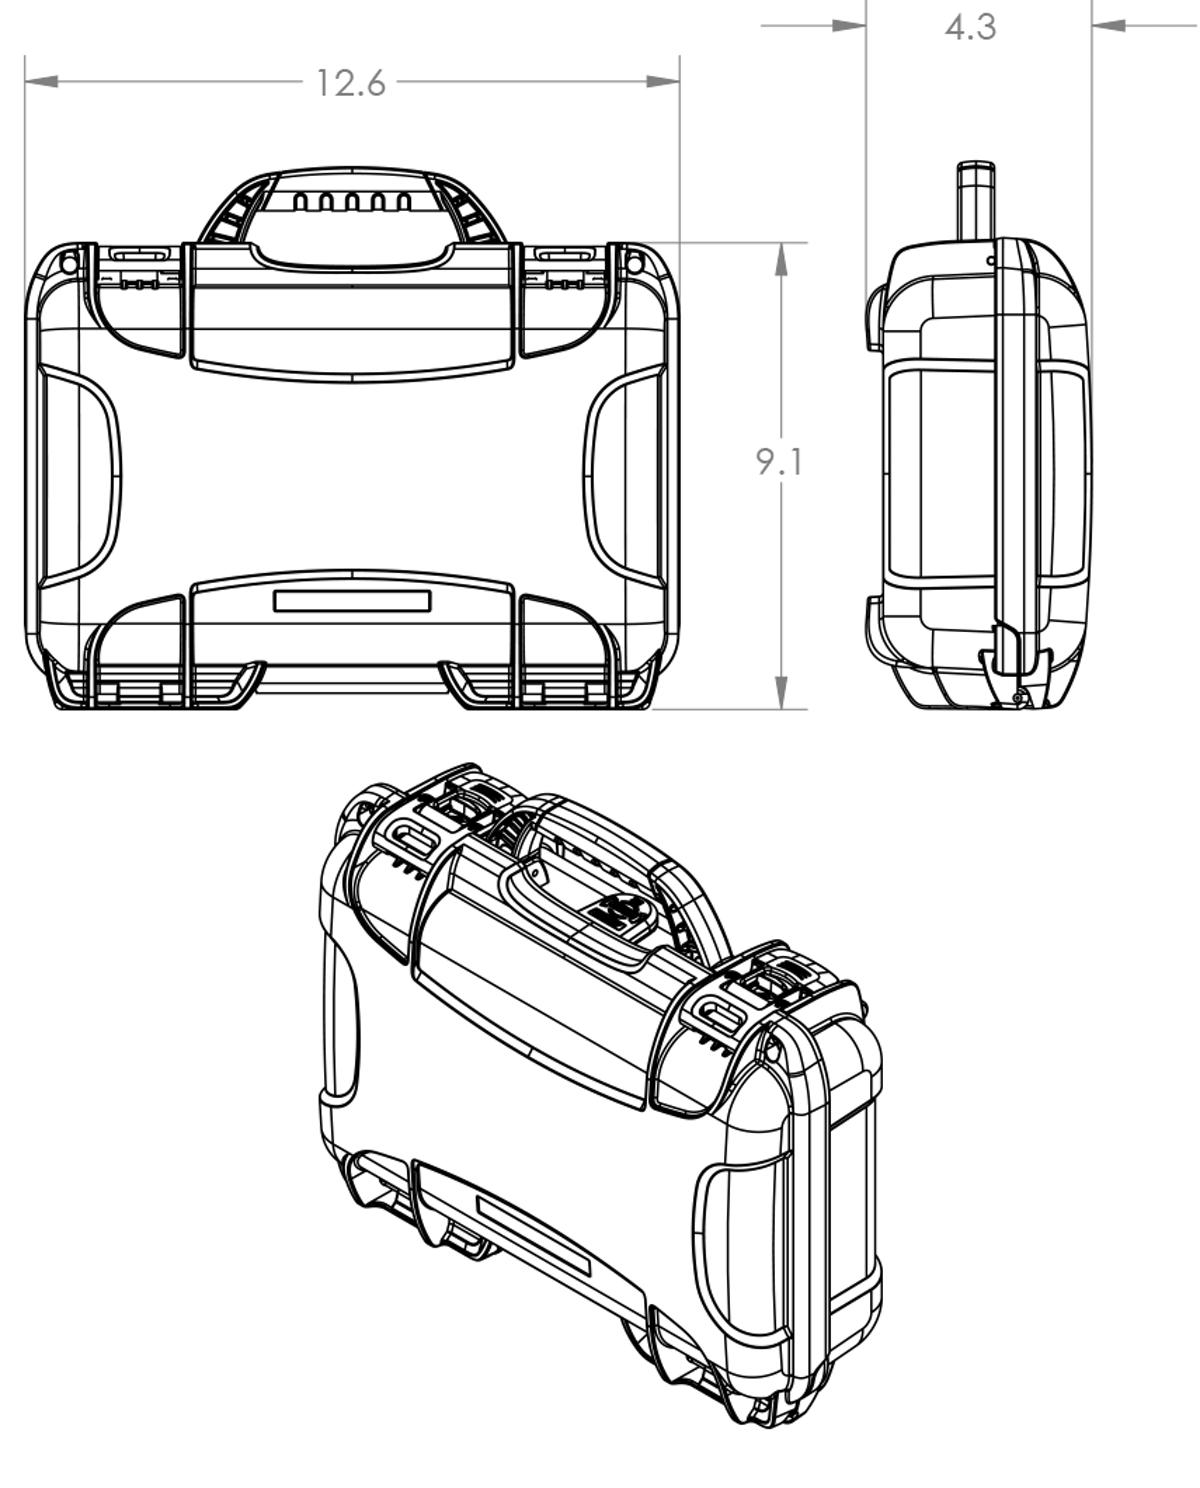 Dimensions of the Nanuk 909 Classic Pistol Case Hard Case